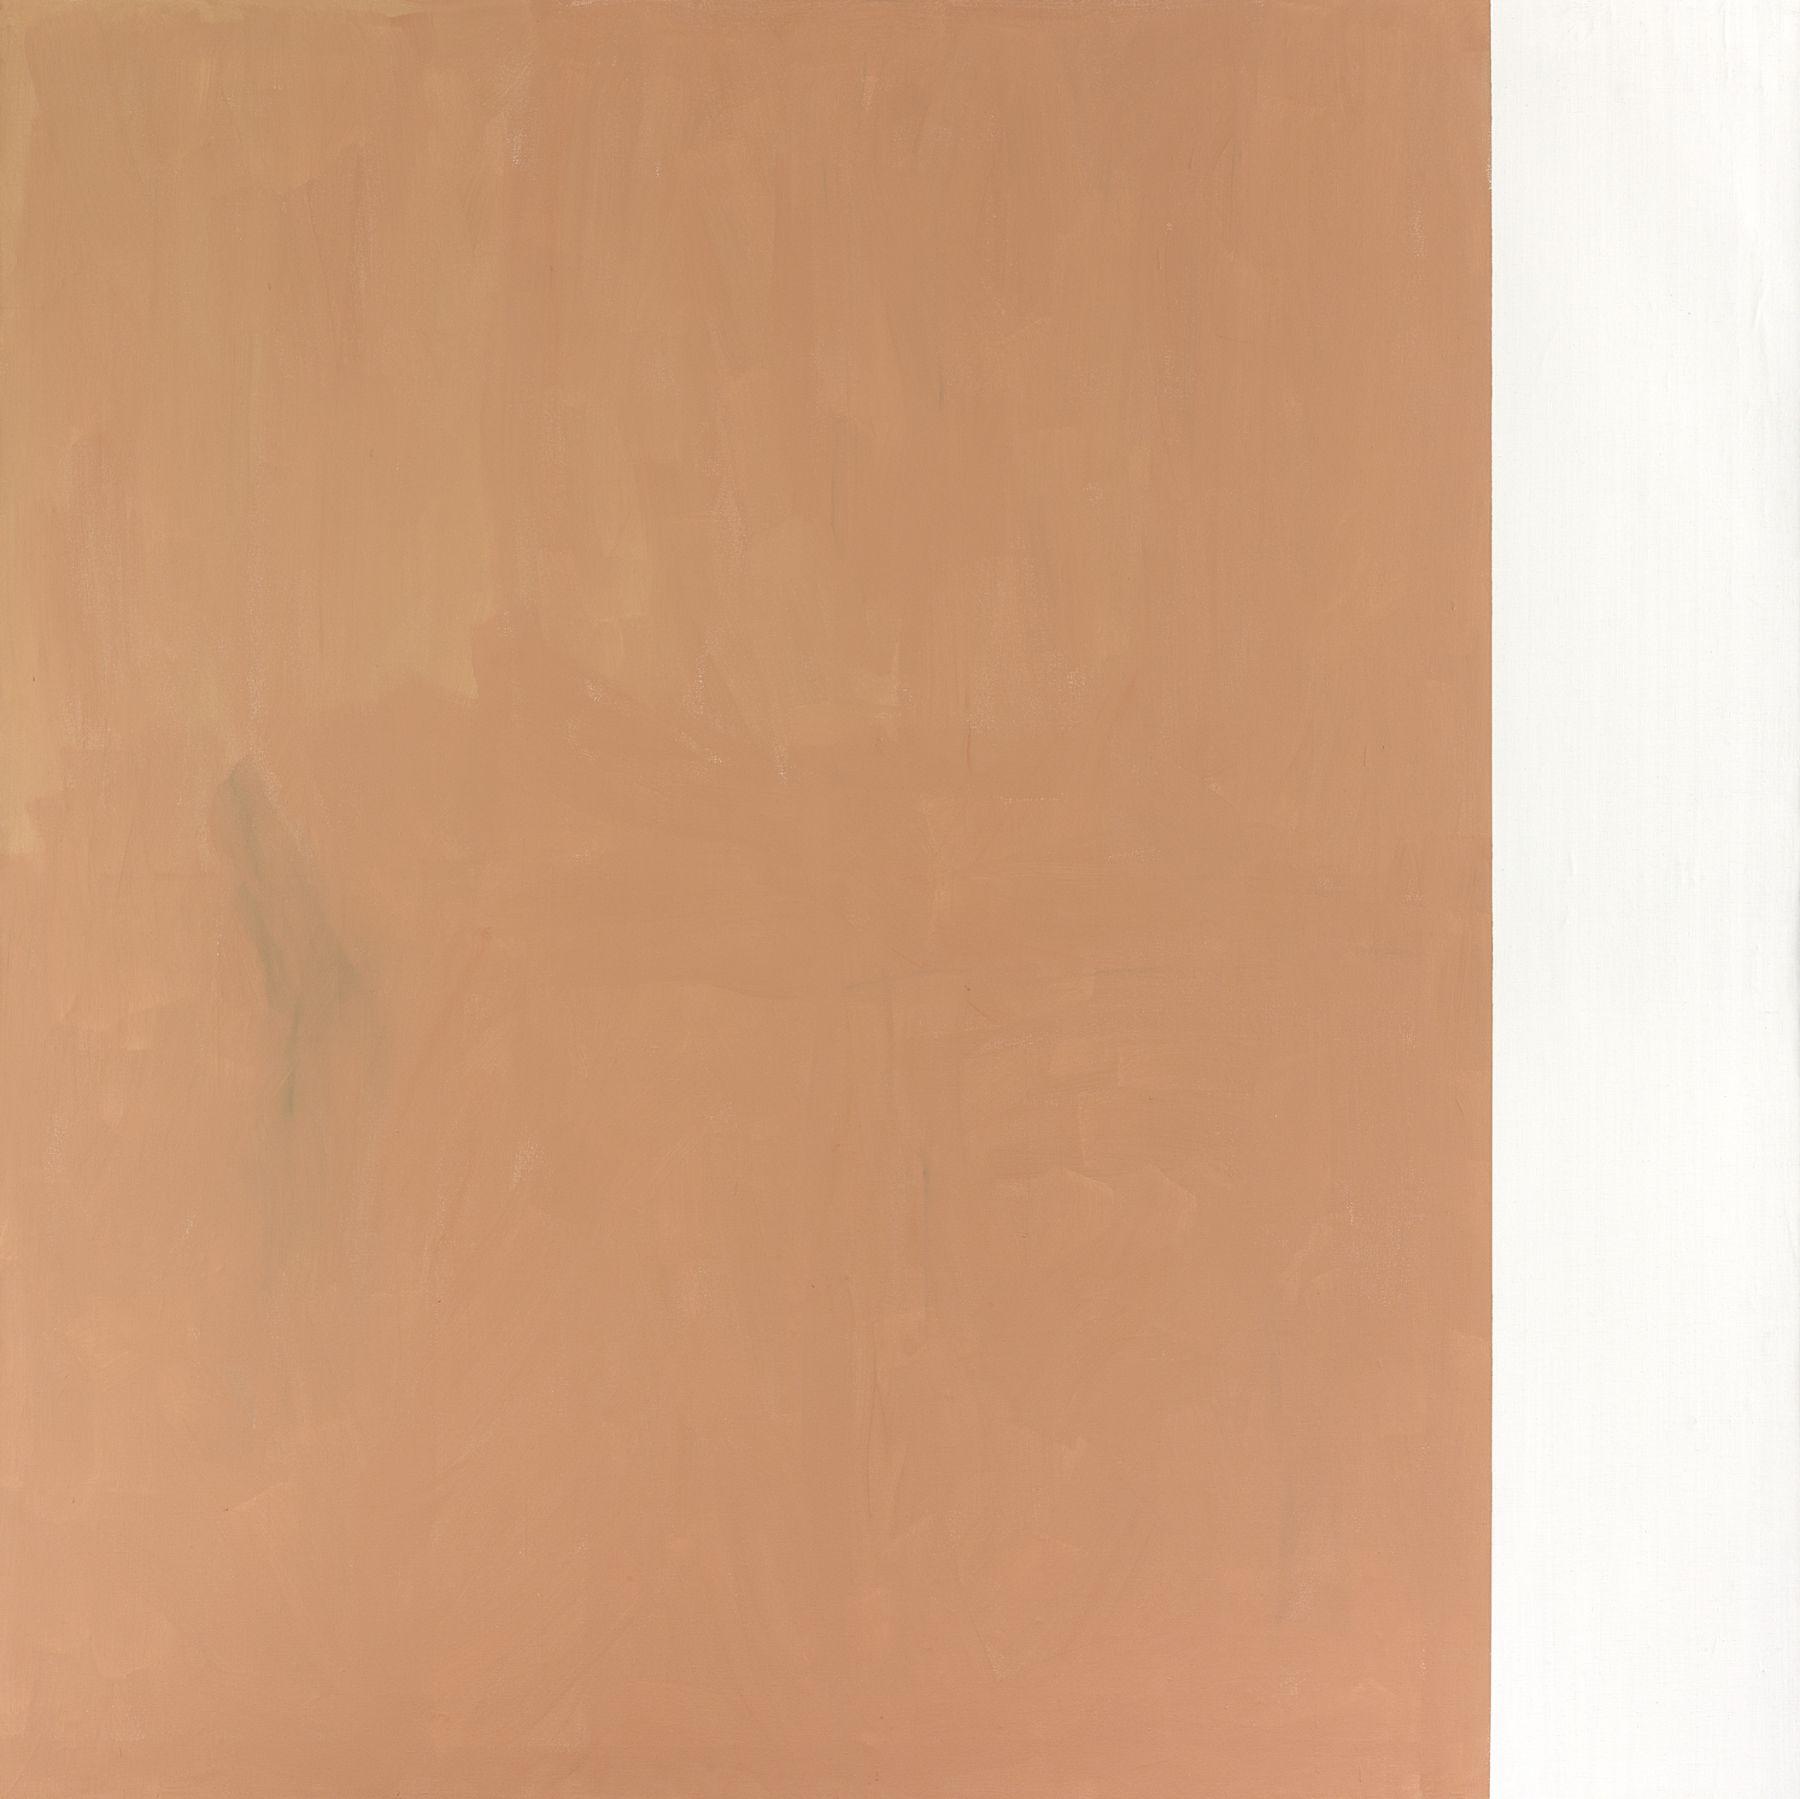 Günther Förg  Untitled, 1991 (detail)  Acrylic on canvas  Ten pieces: 114 1/8 x 114 1/8 inches (290 x 290 cm) each